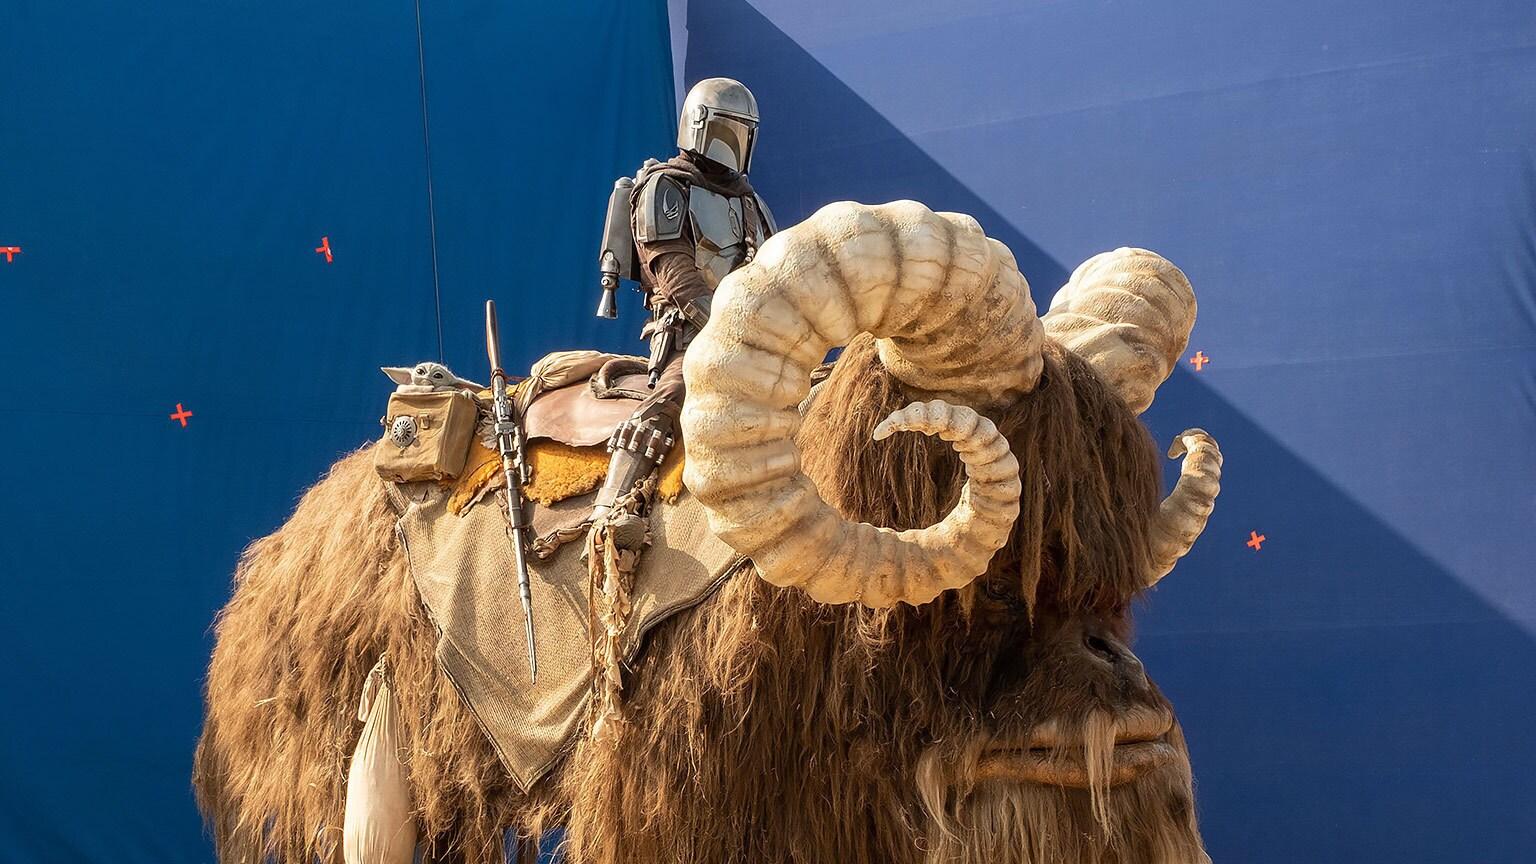 ILM Celebrates The Mandalorian Season 2's Groundbreaking Visual Effects